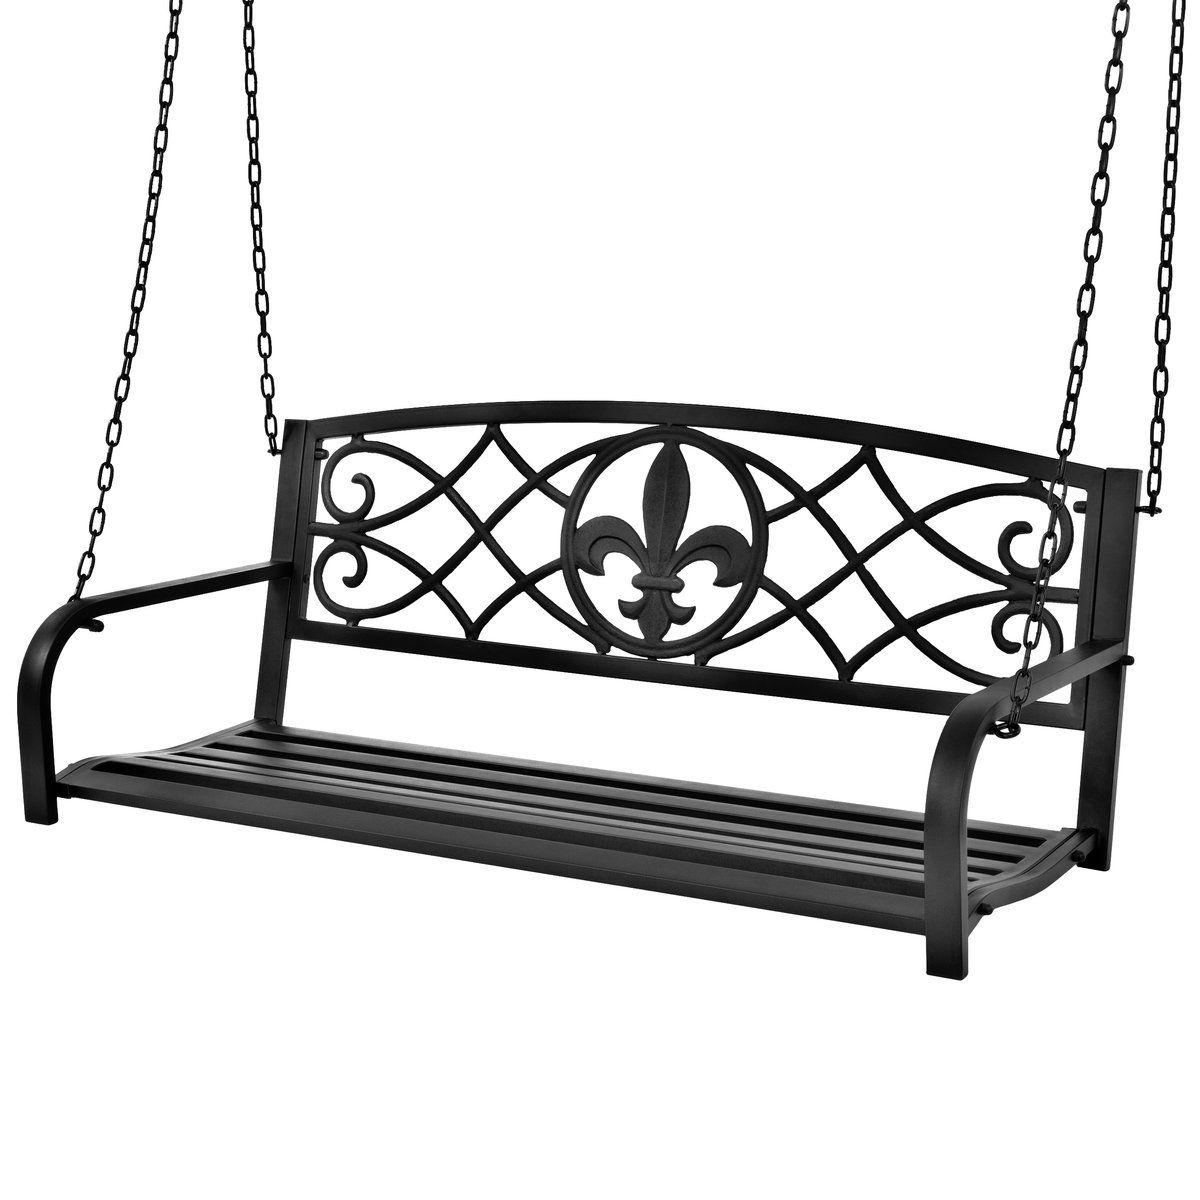 Famous 2 Person Gray Steel Outdoor Swings In Outdoor Metal Hanging 2 Person Swing Bench W/ Fleur De Lis (View 12 of 25)